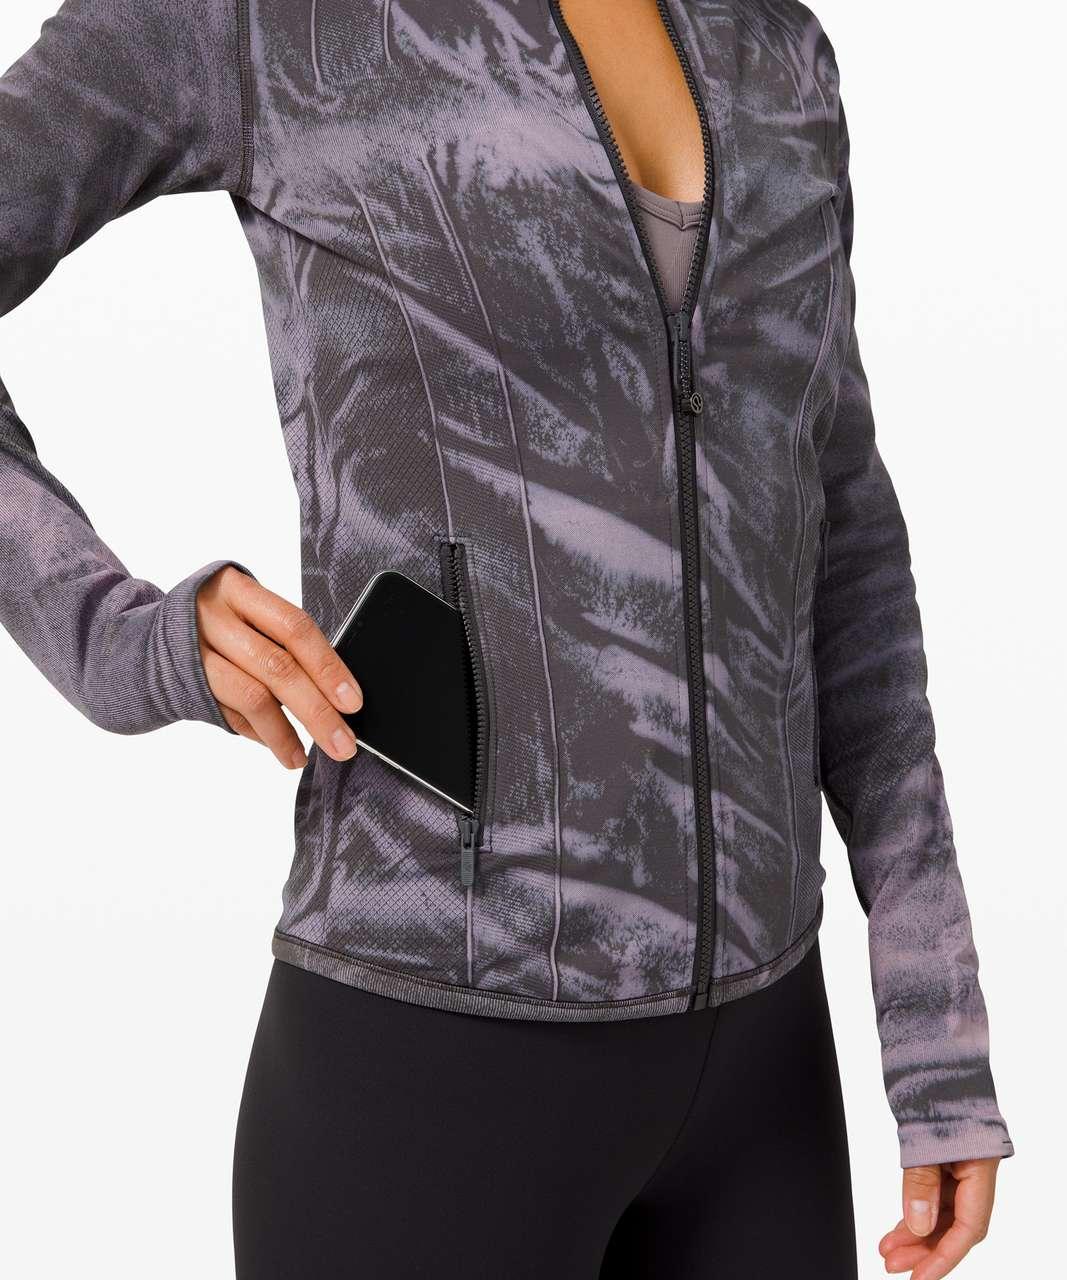 Lululemon Ebb to Street Define Jacket *Wash - Stone Wash Graphite Grey